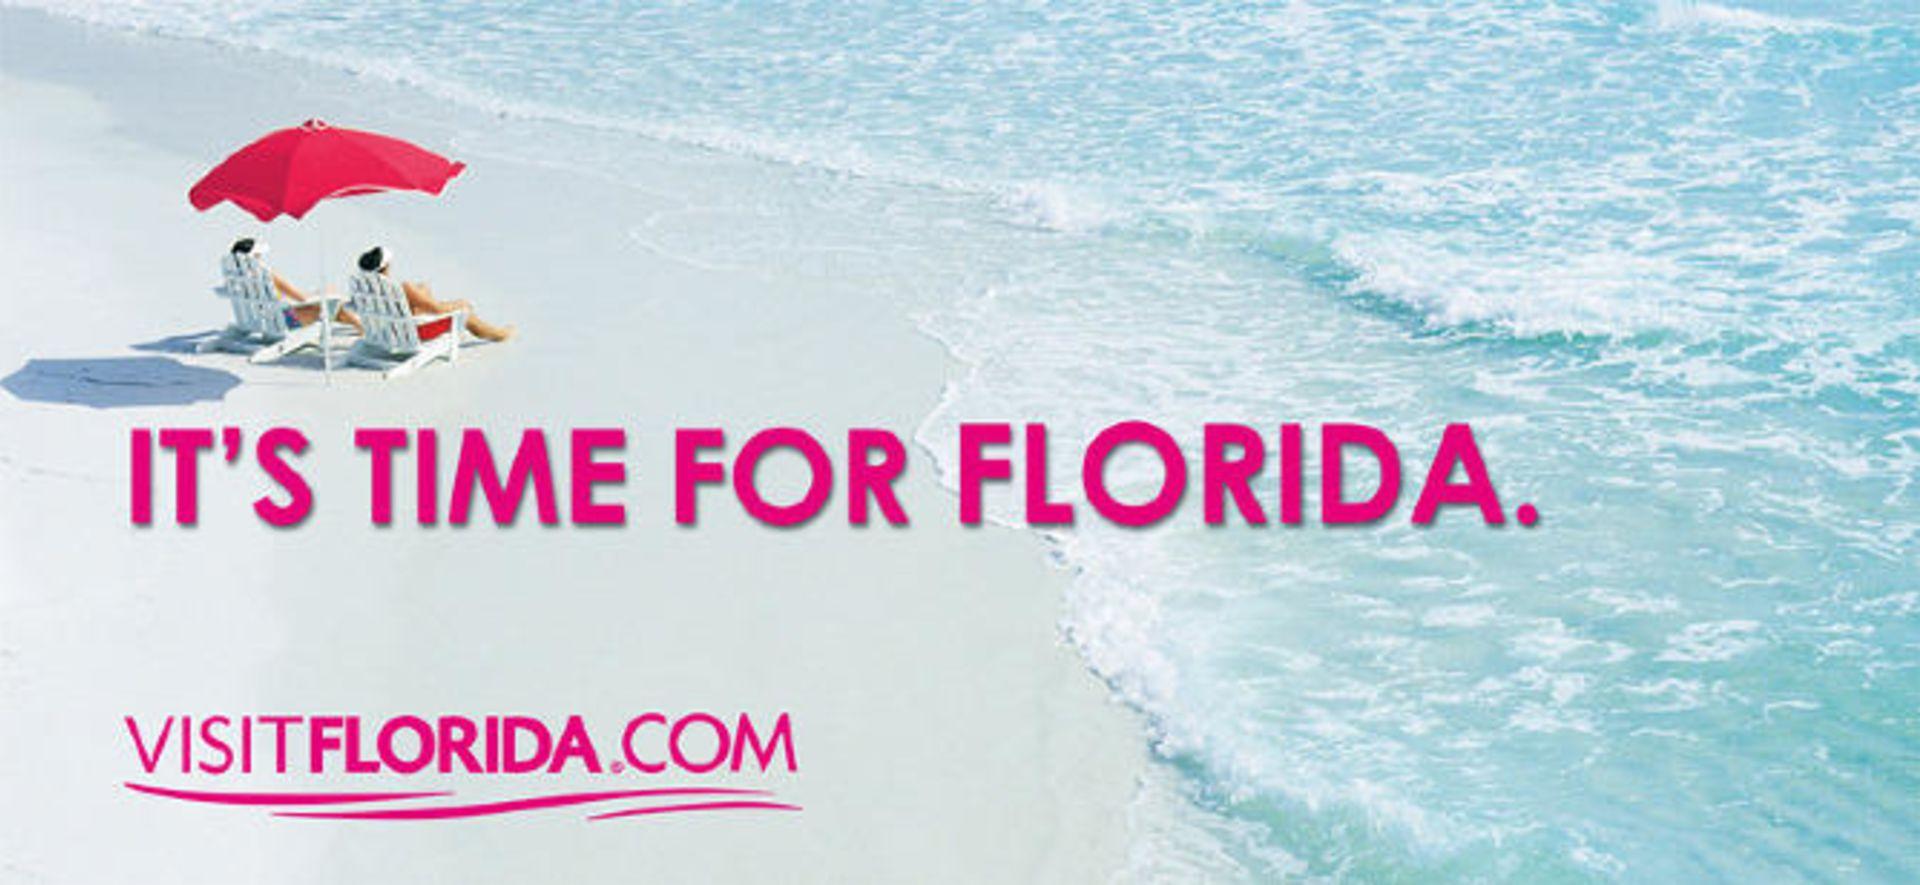 Florida Continues to Break Visitation Records